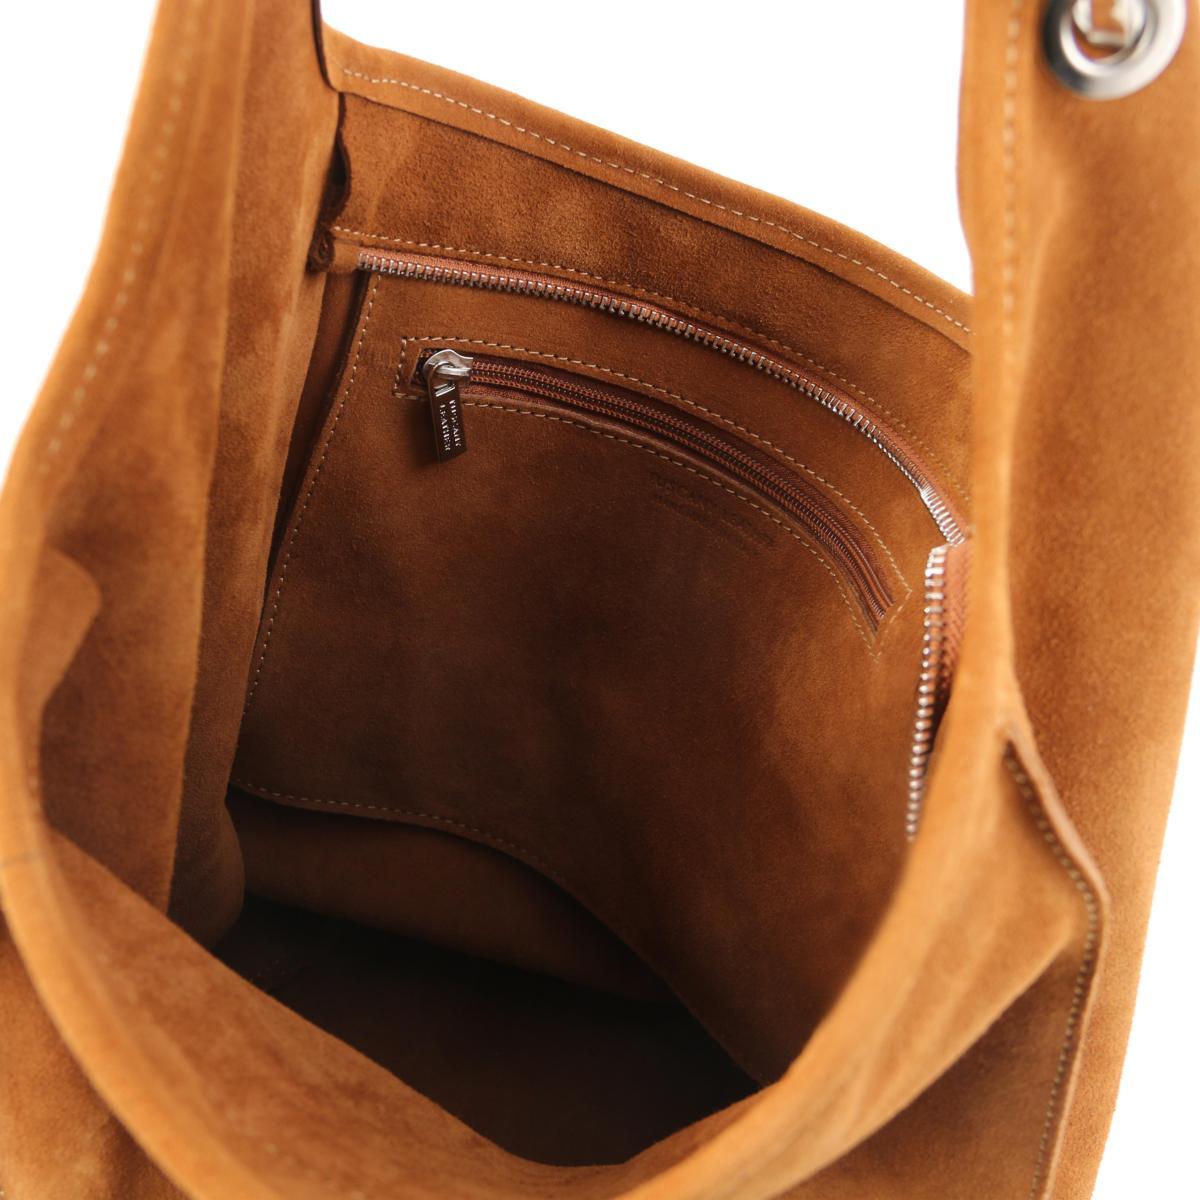 Sac Daim Leather en Epaule Femme pour Tuscany AwnSfAq6